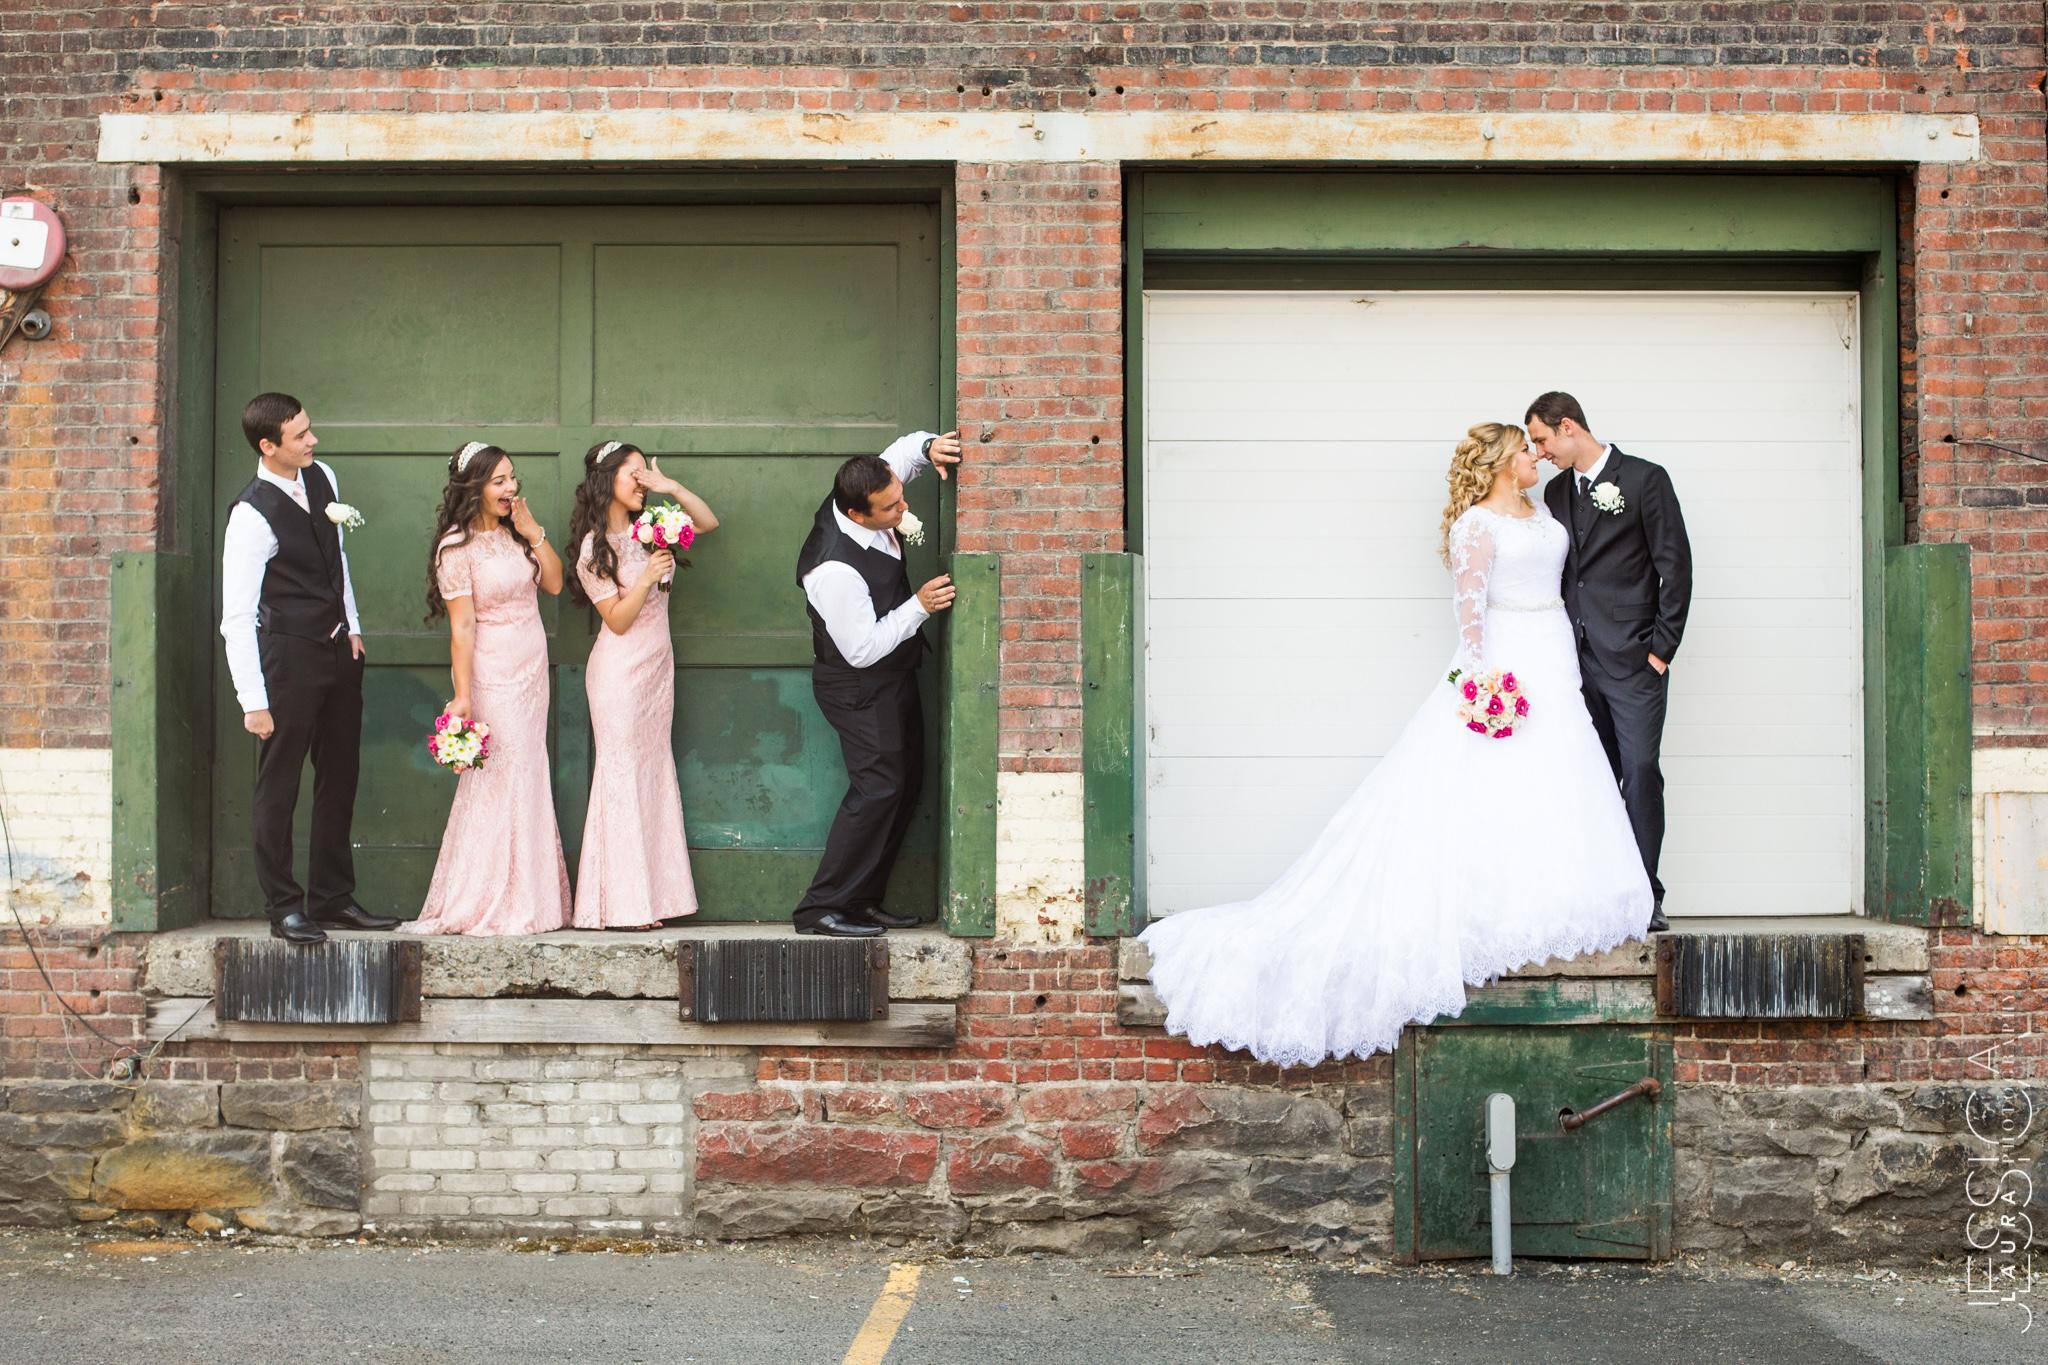 Eugene-Maryana_wedding_08062017_web (126 of 558).JPG